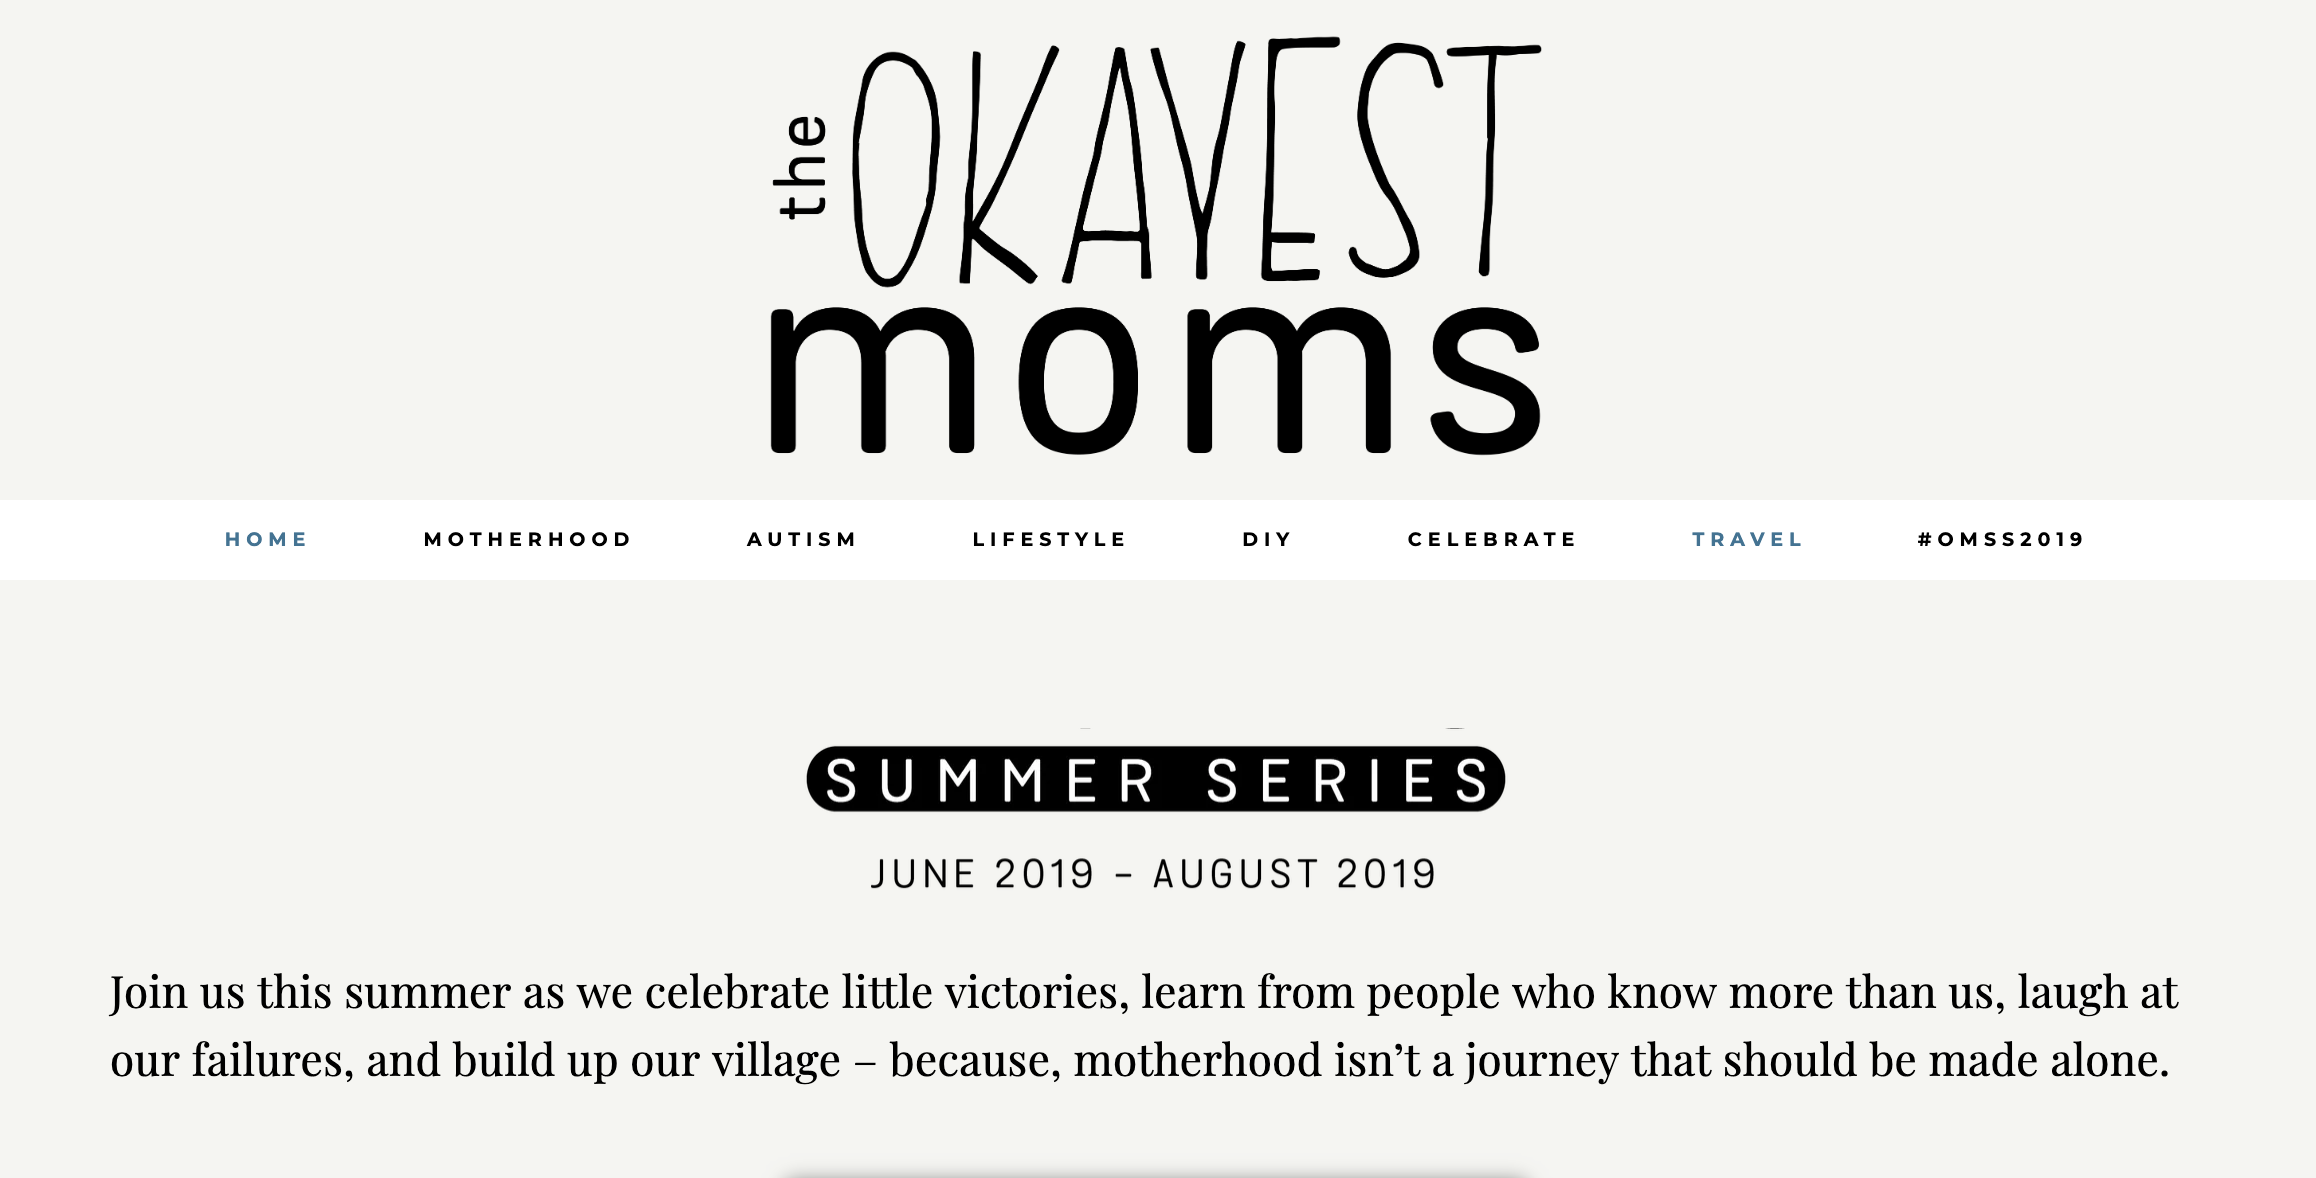 Okayest Moms - Summer Series 2019